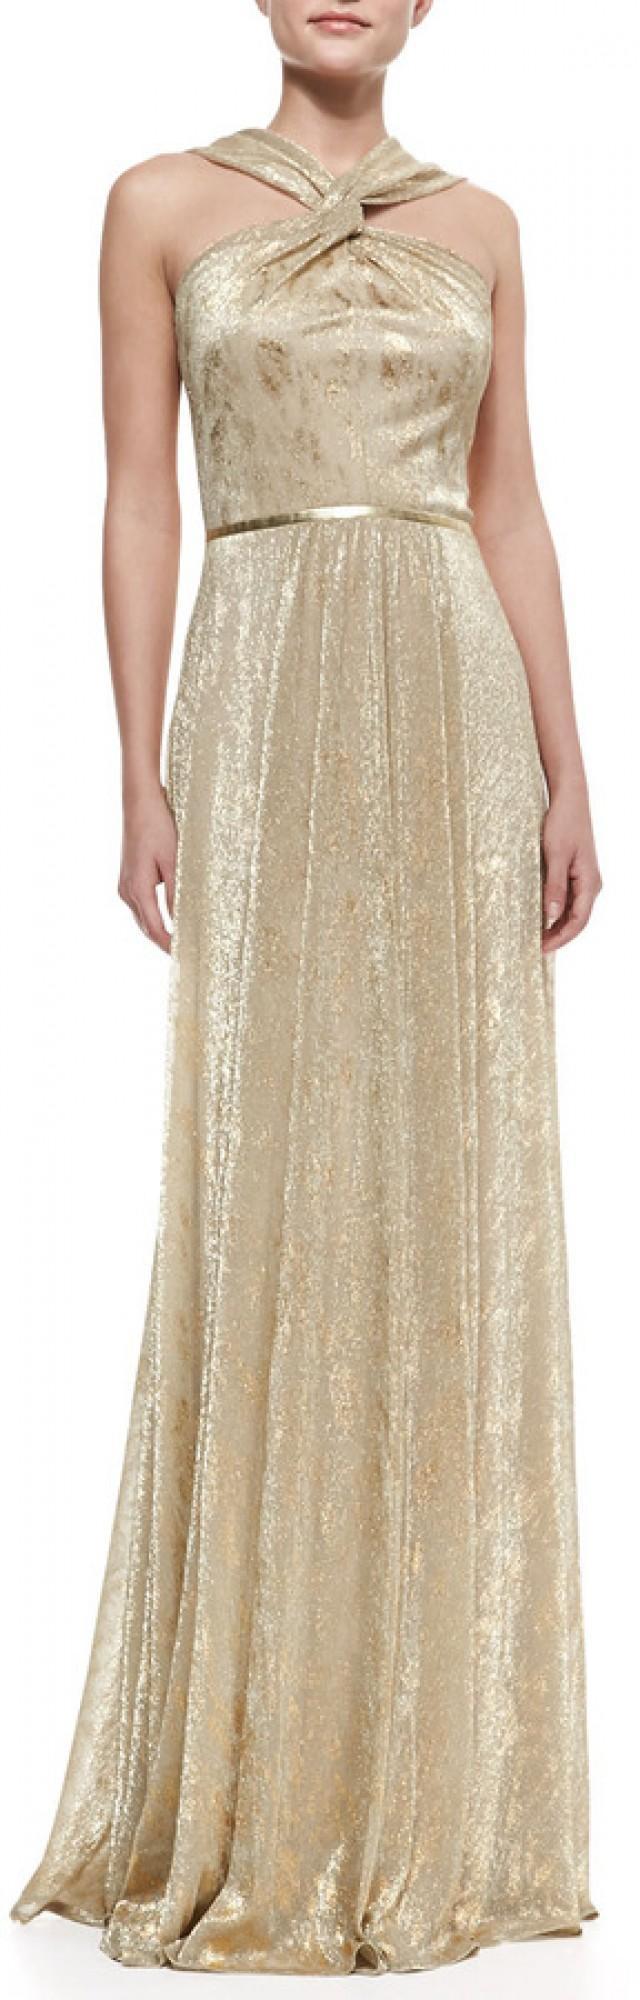 David Meister Halter-Style Metallic Gown, Gold #2154165 - Weddbook